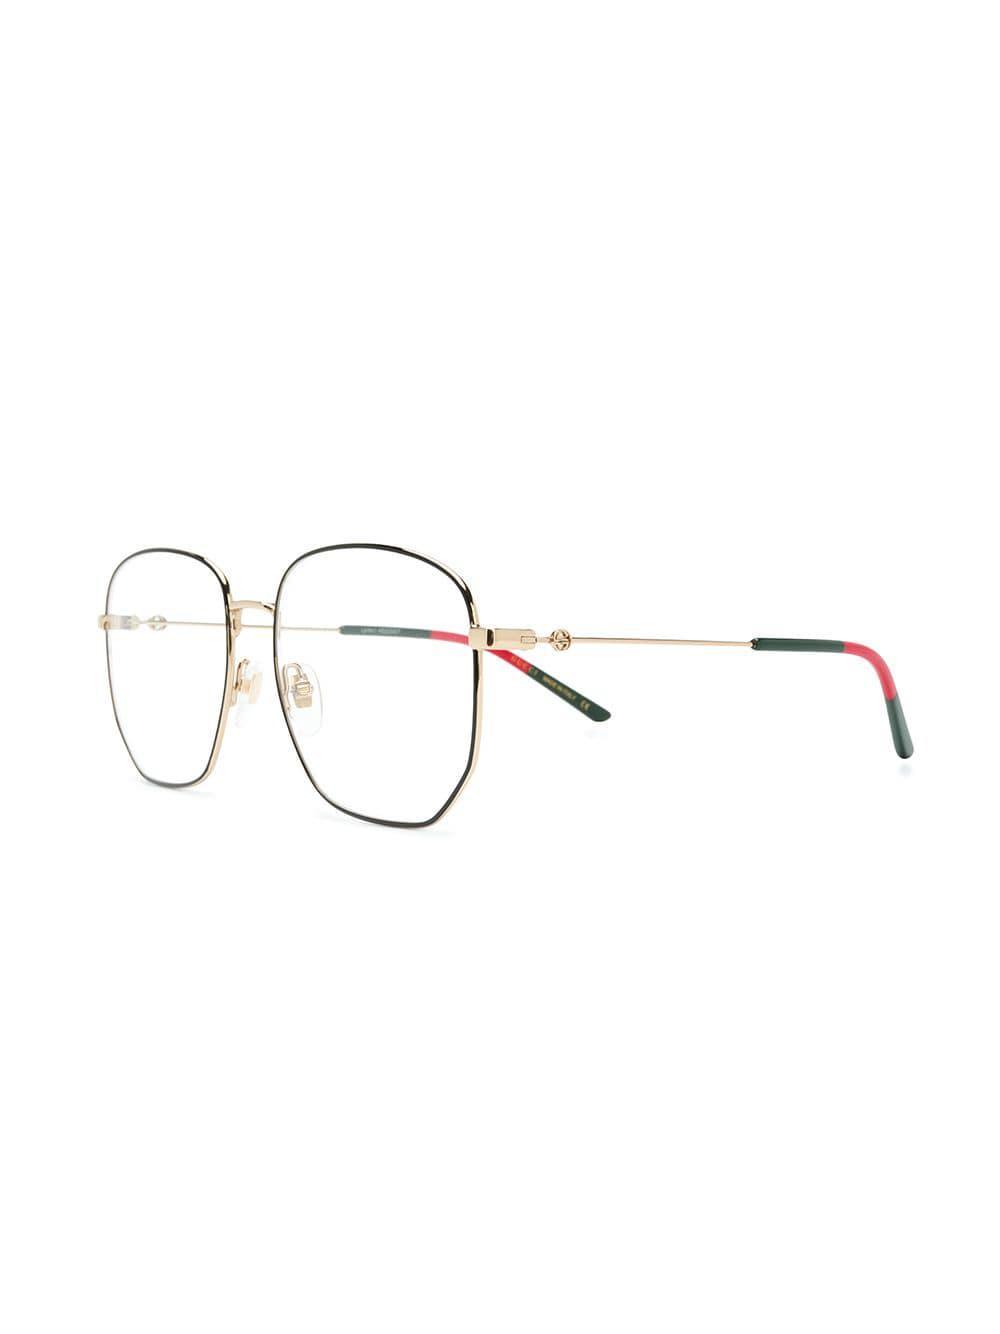 75581d3fa3 Gucci Hexagonal Frame Glasses in Black - Lyst